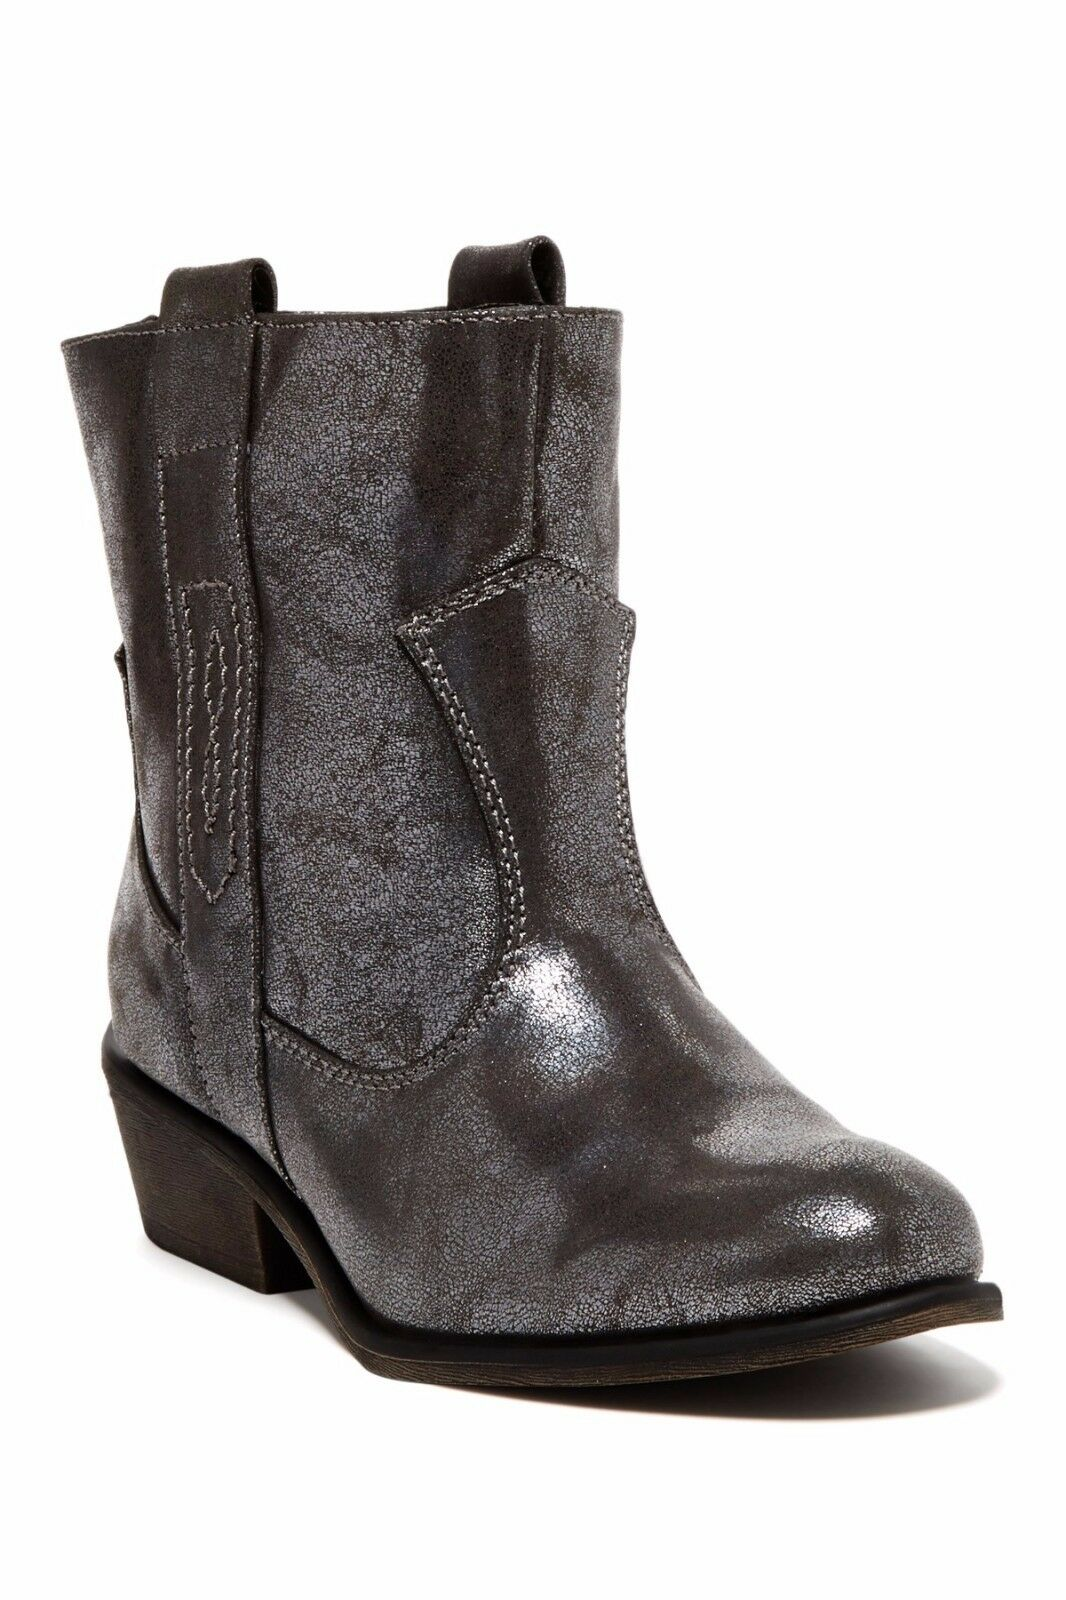 New  Charles David Dapper Ankle Leder Damens's  New Stiefel  Größe 5.5 4ae9ea